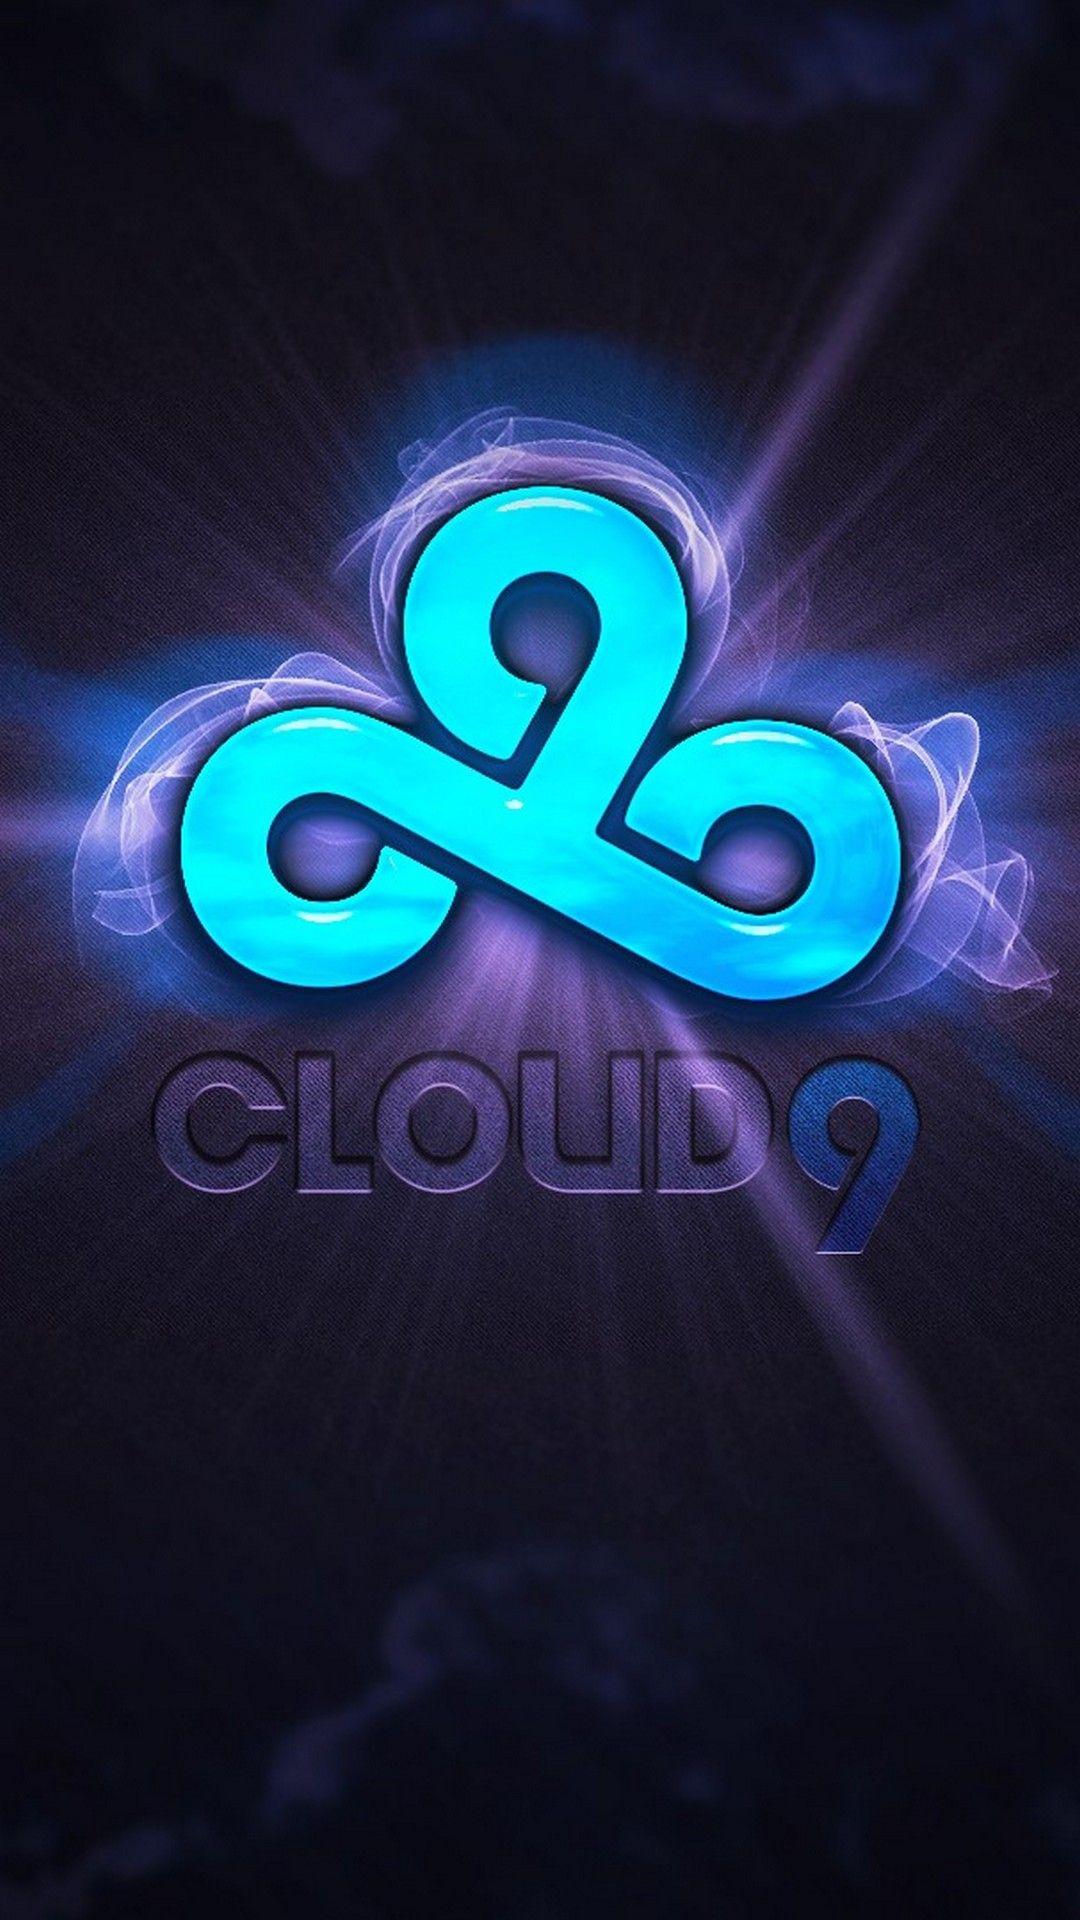 Wallpaper Cloud 9 Games iPhone (มีรูปภาพ) พื้นหลัง